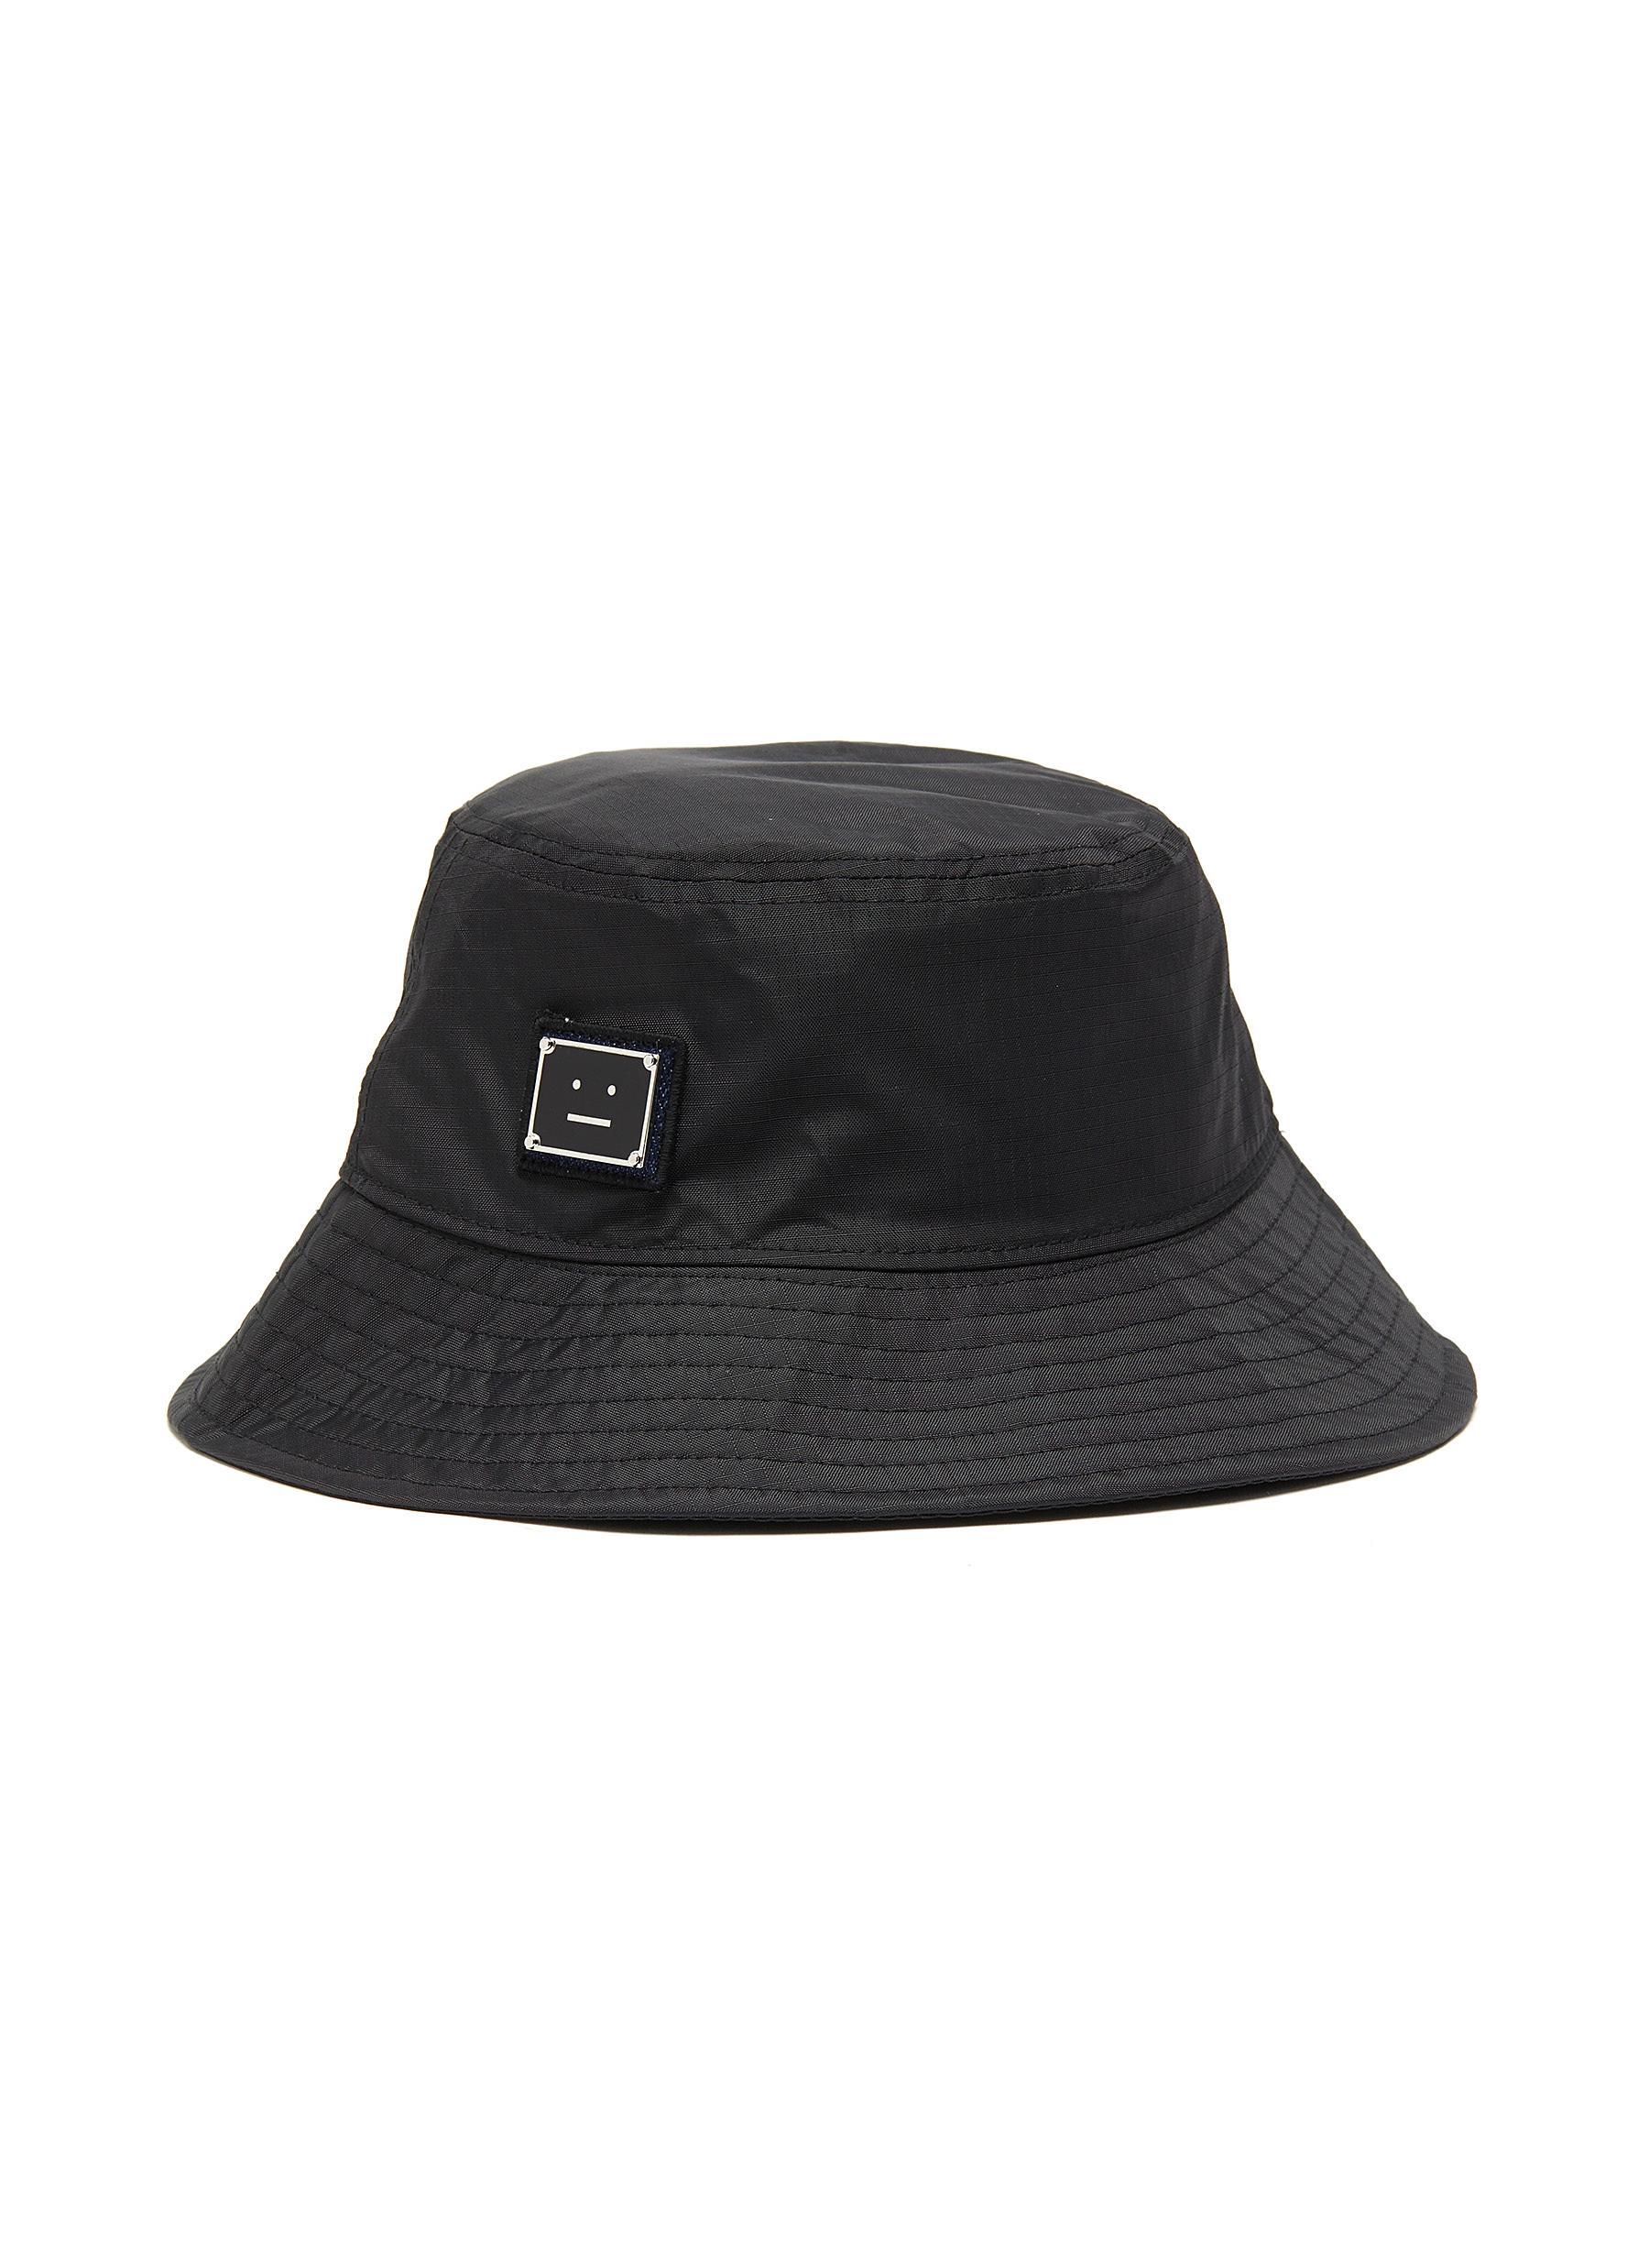 Acne Studios Hats FACE PLAQUE NYLON BUCKET HAT